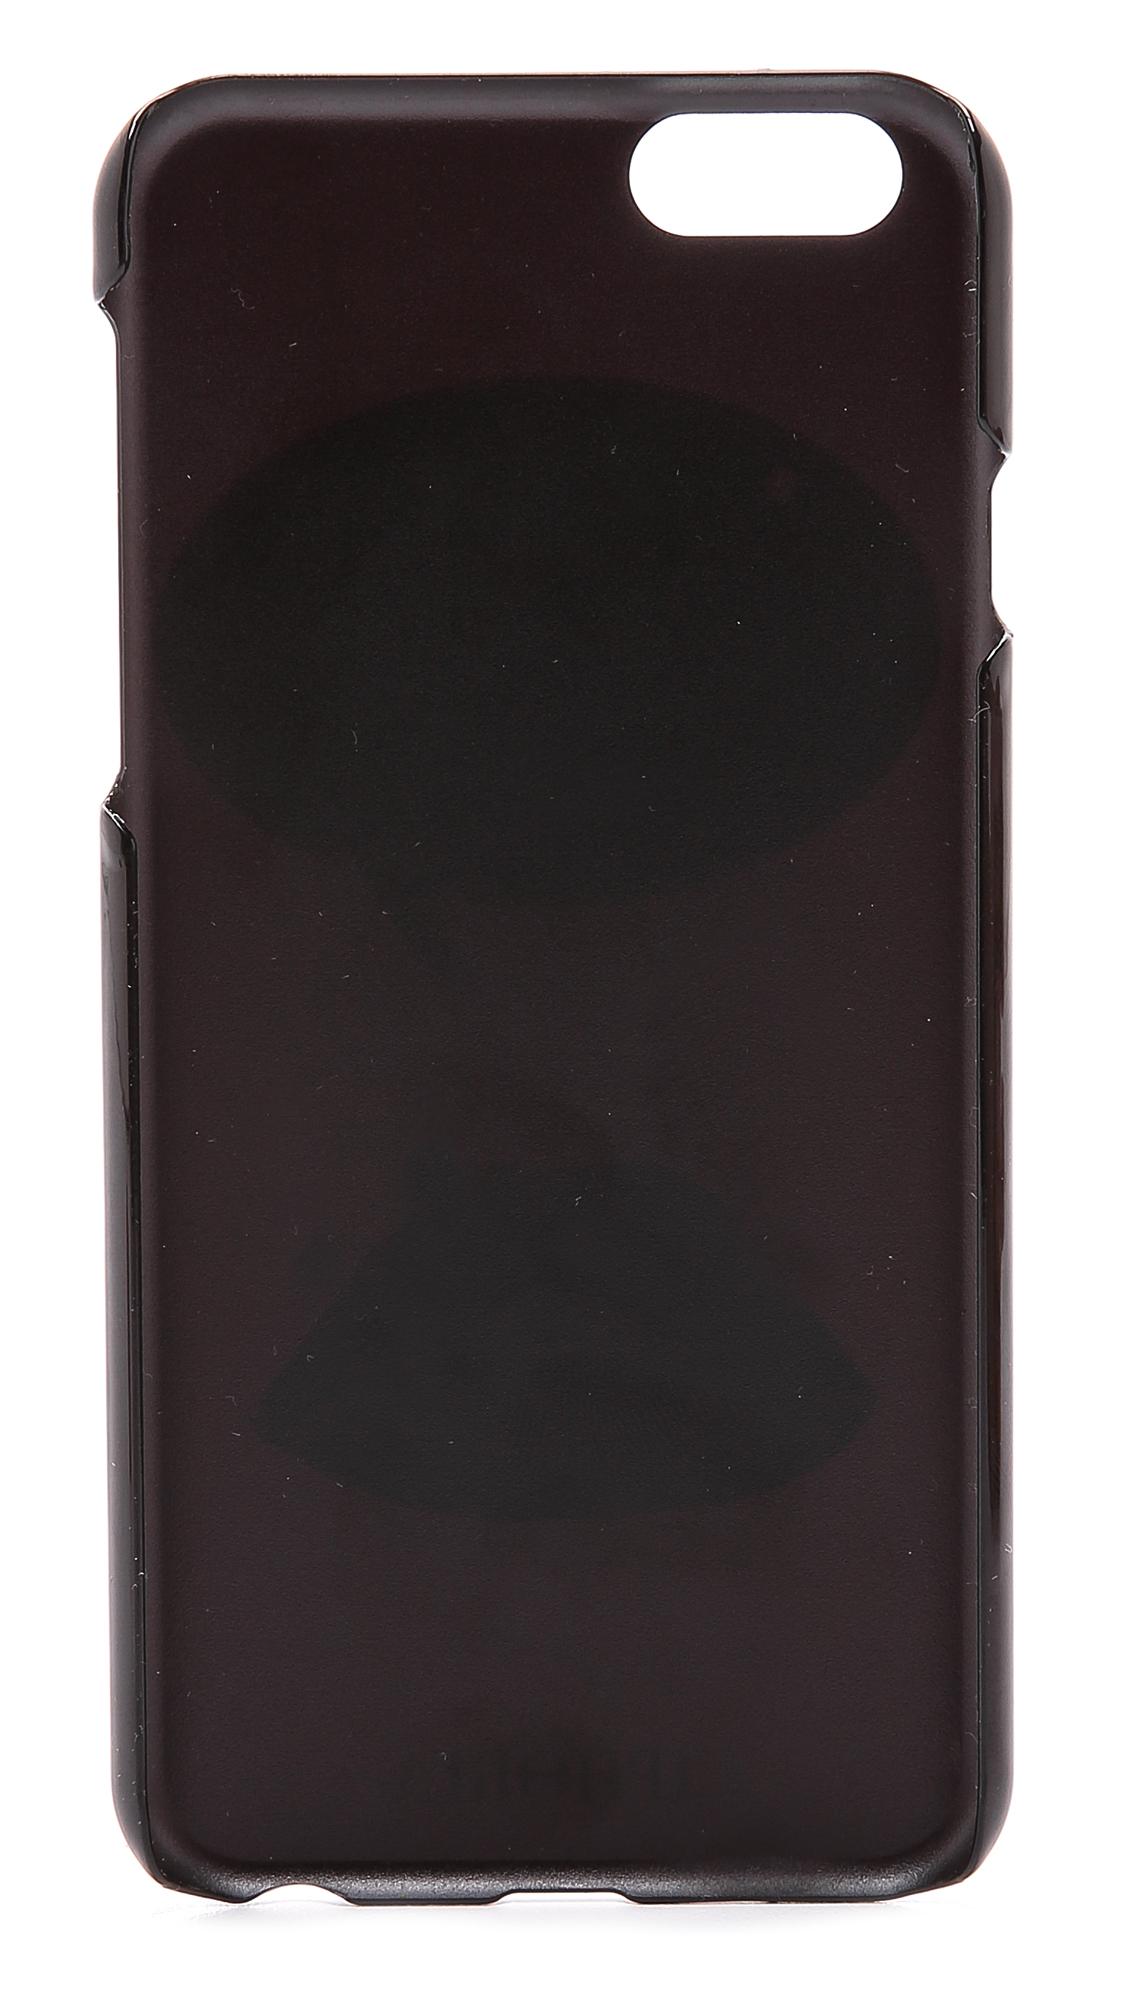 iphoria oh la la iphone 6 case black multi in black lyst. Black Bedroom Furniture Sets. Home Design Ideas